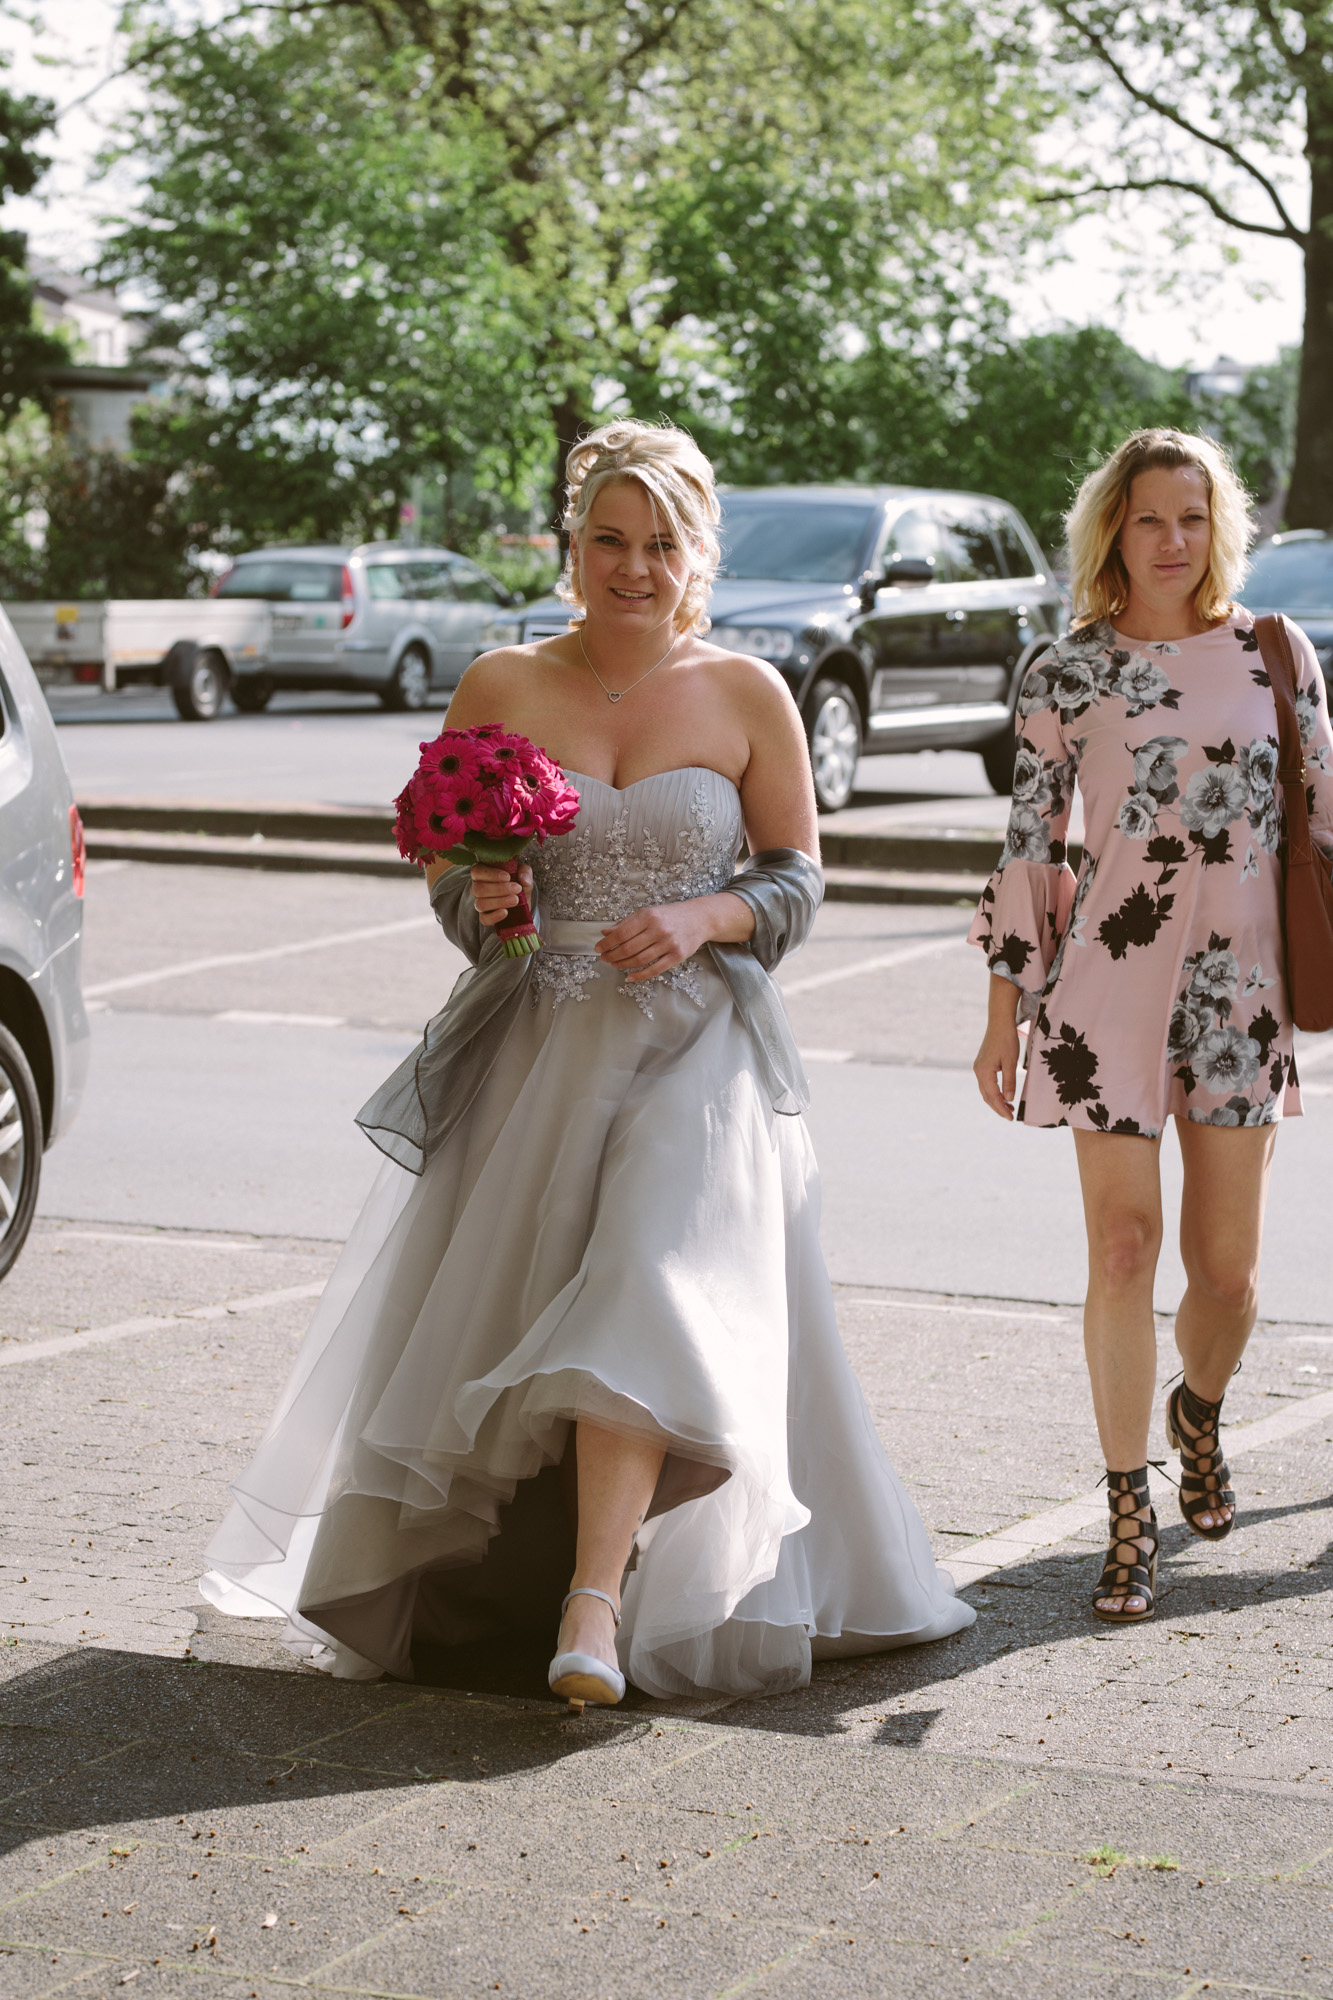 Claudia-Krawinkel-Hochzeitsfotografie-Essen-Duisburg-Standesamt-Schloss-Borbeck-1